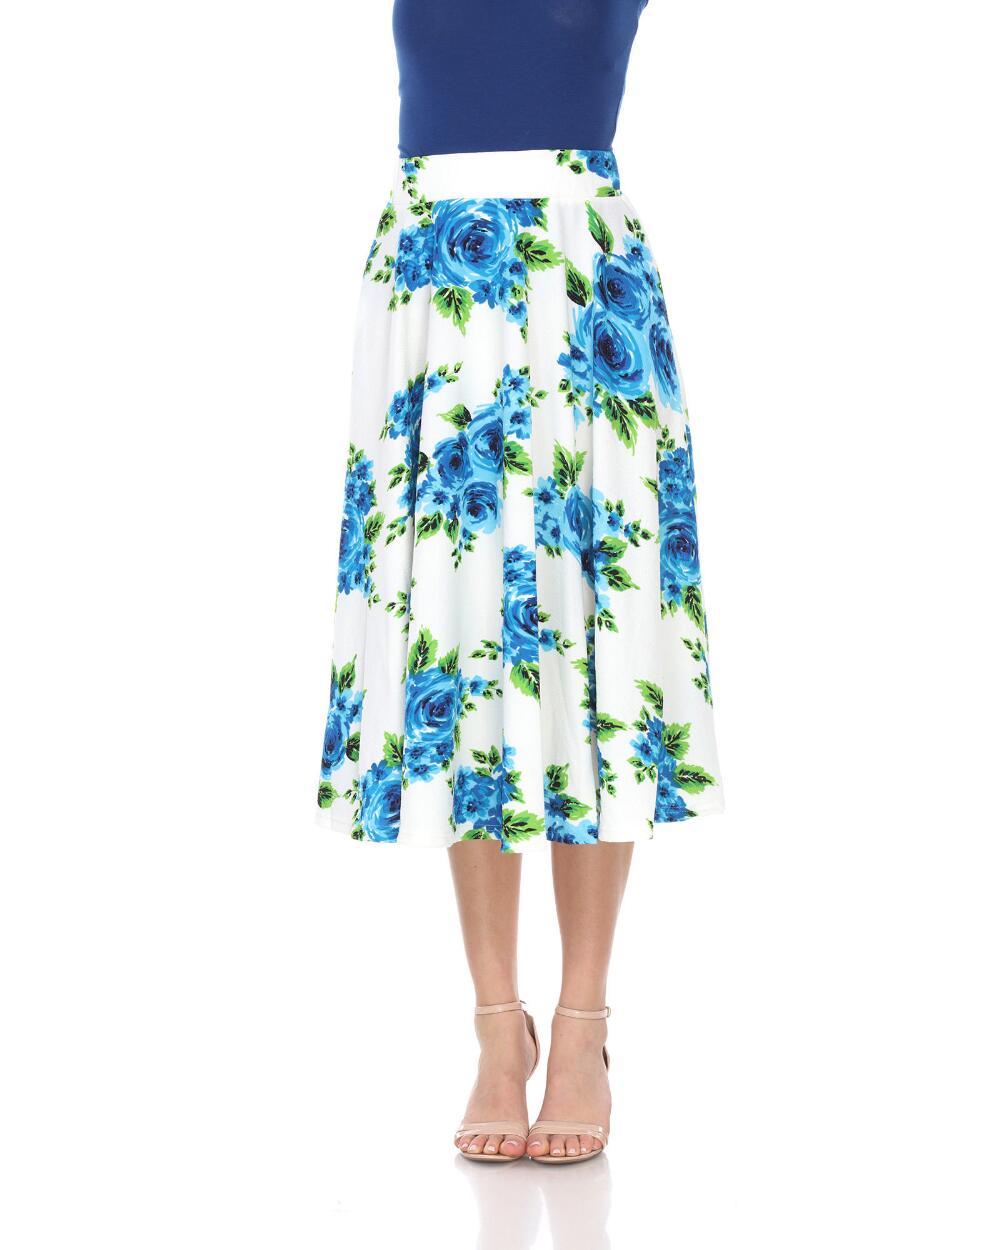 Flared Midi Skirt With Pockets Skirts Clothing Women Stein Mart Midi Flare Skirt Printed Midi Skirt Floral Print Midi Skirt [ 1250 x 1000 Pixel ]